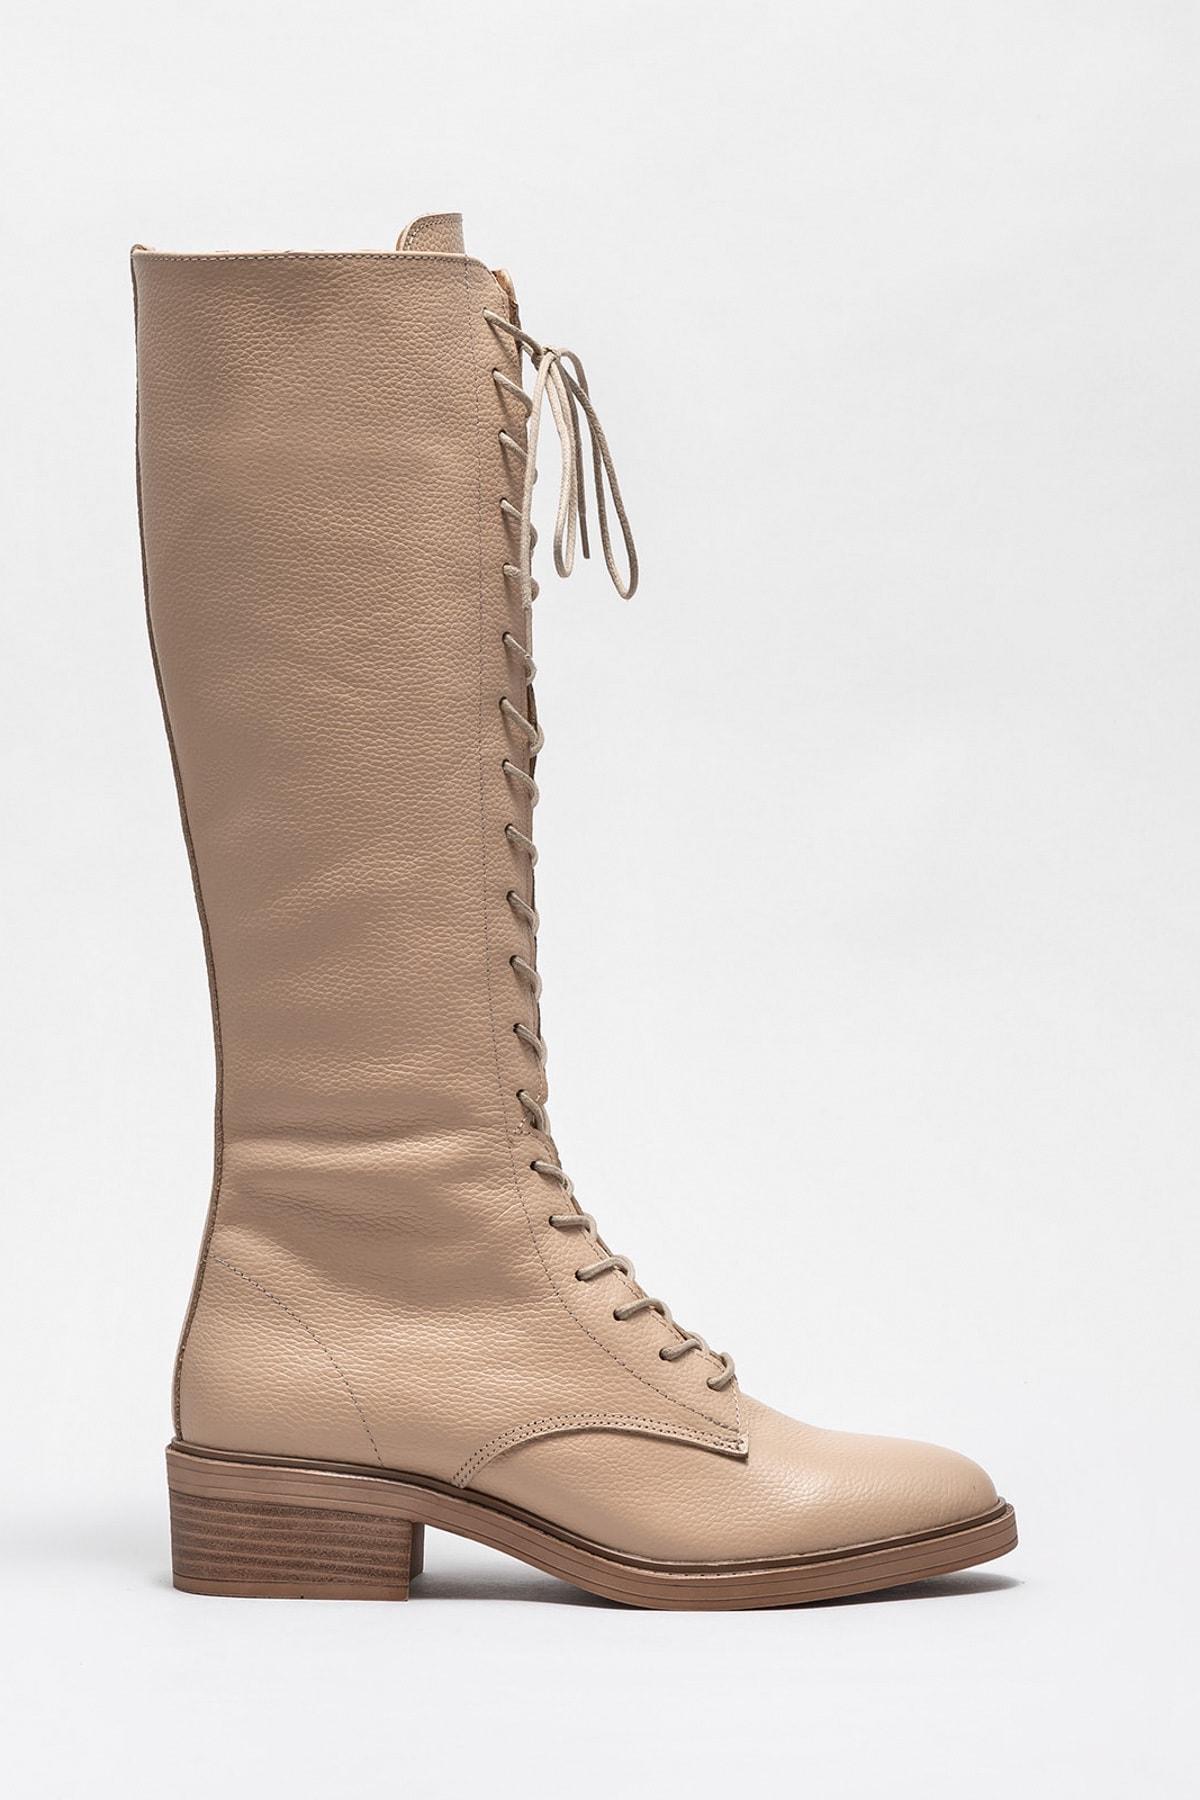 Elle Shoes Kadın Çizme Dallys 20KBS6636 1